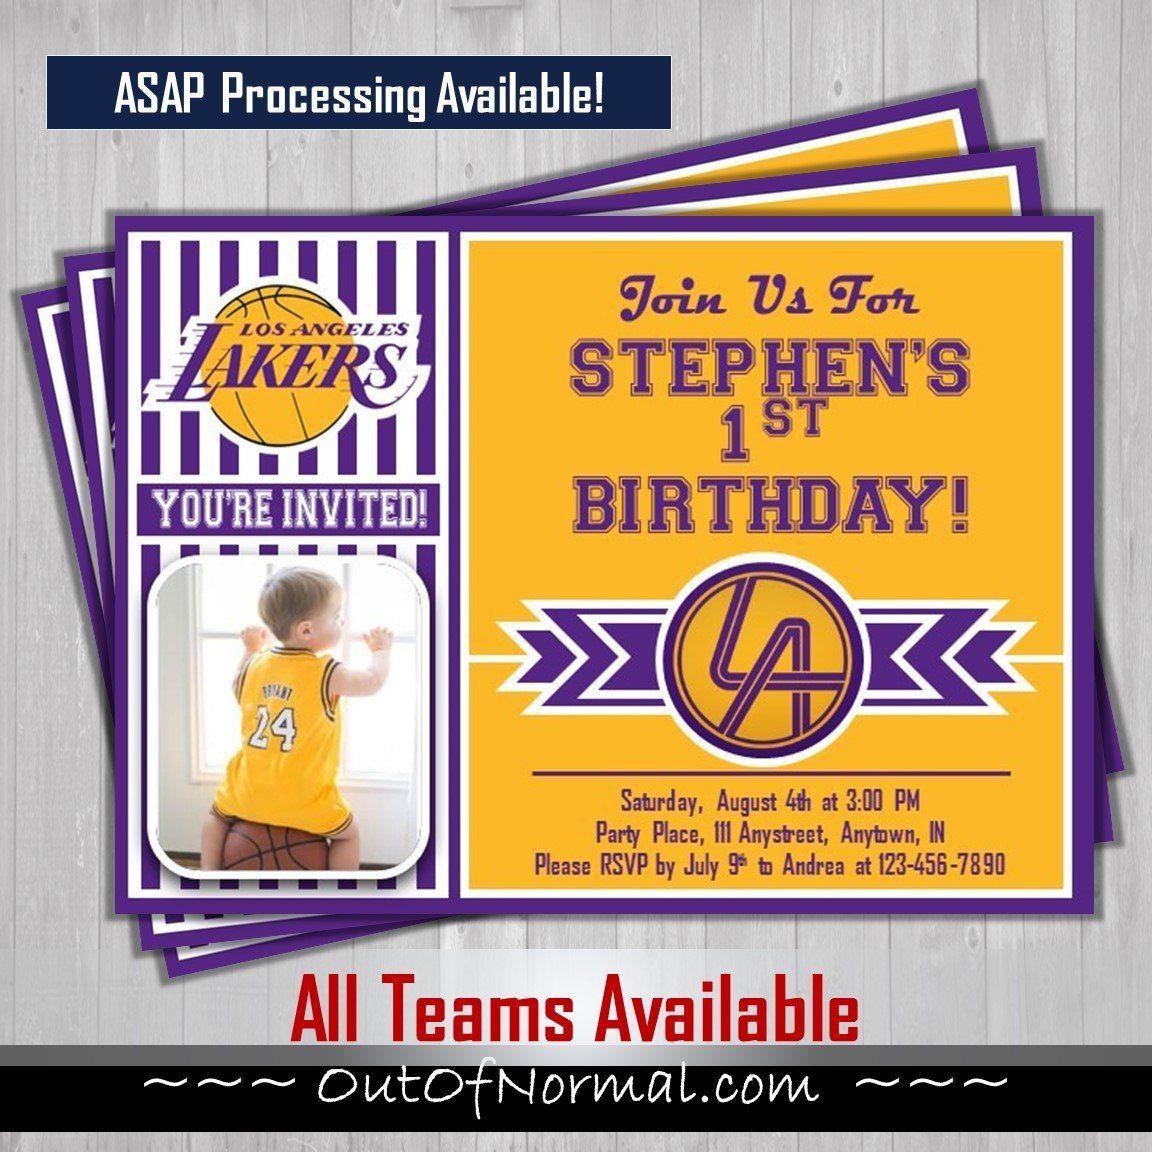 Los Angeles Lakers Nba Basketball Photo Invitation Basketball Birthday Invitations Basketball Birthday Football Birthday Invitations